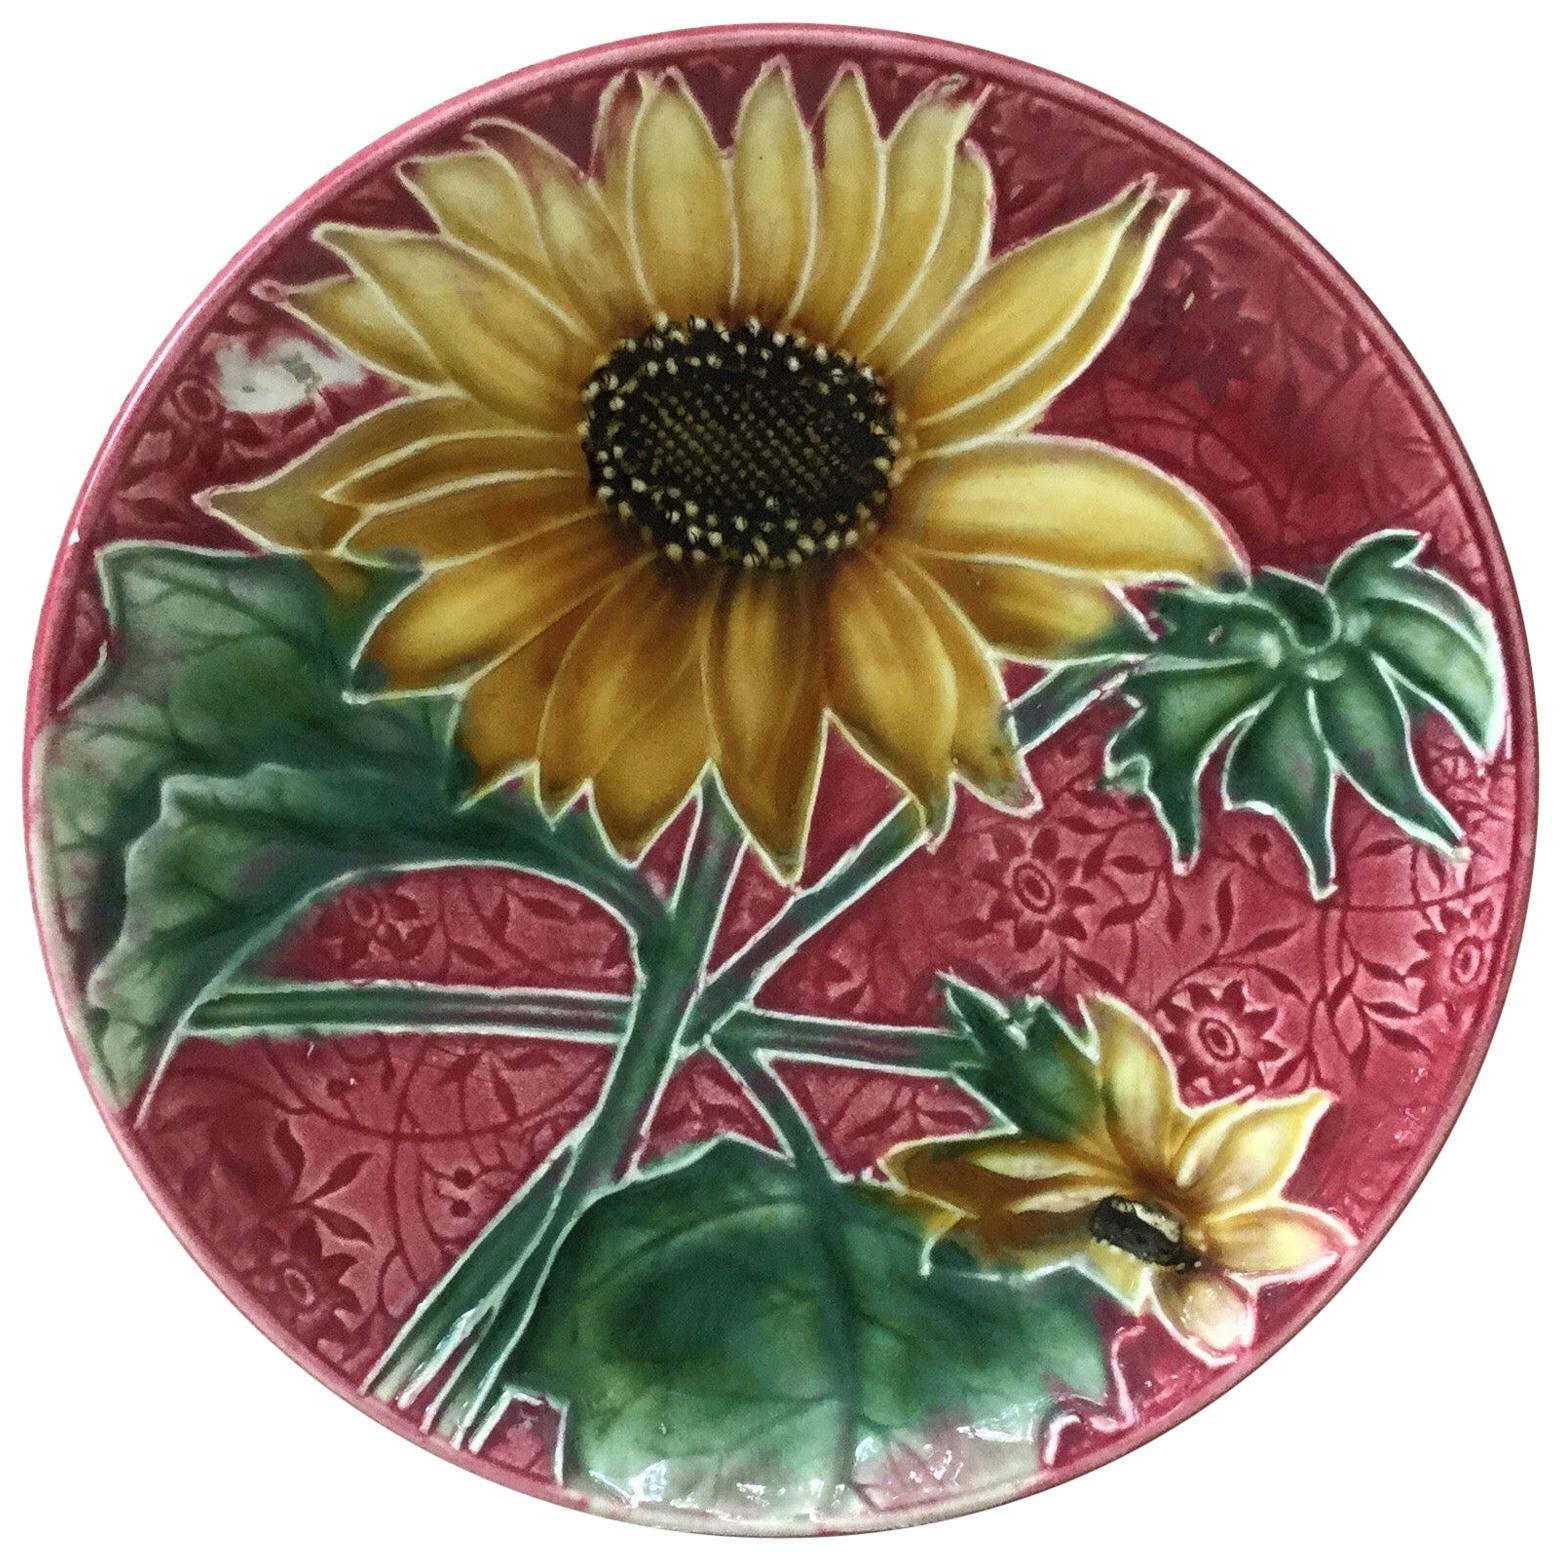 Majolica Sunflower Plate Villeroy & Boch, circa 1900